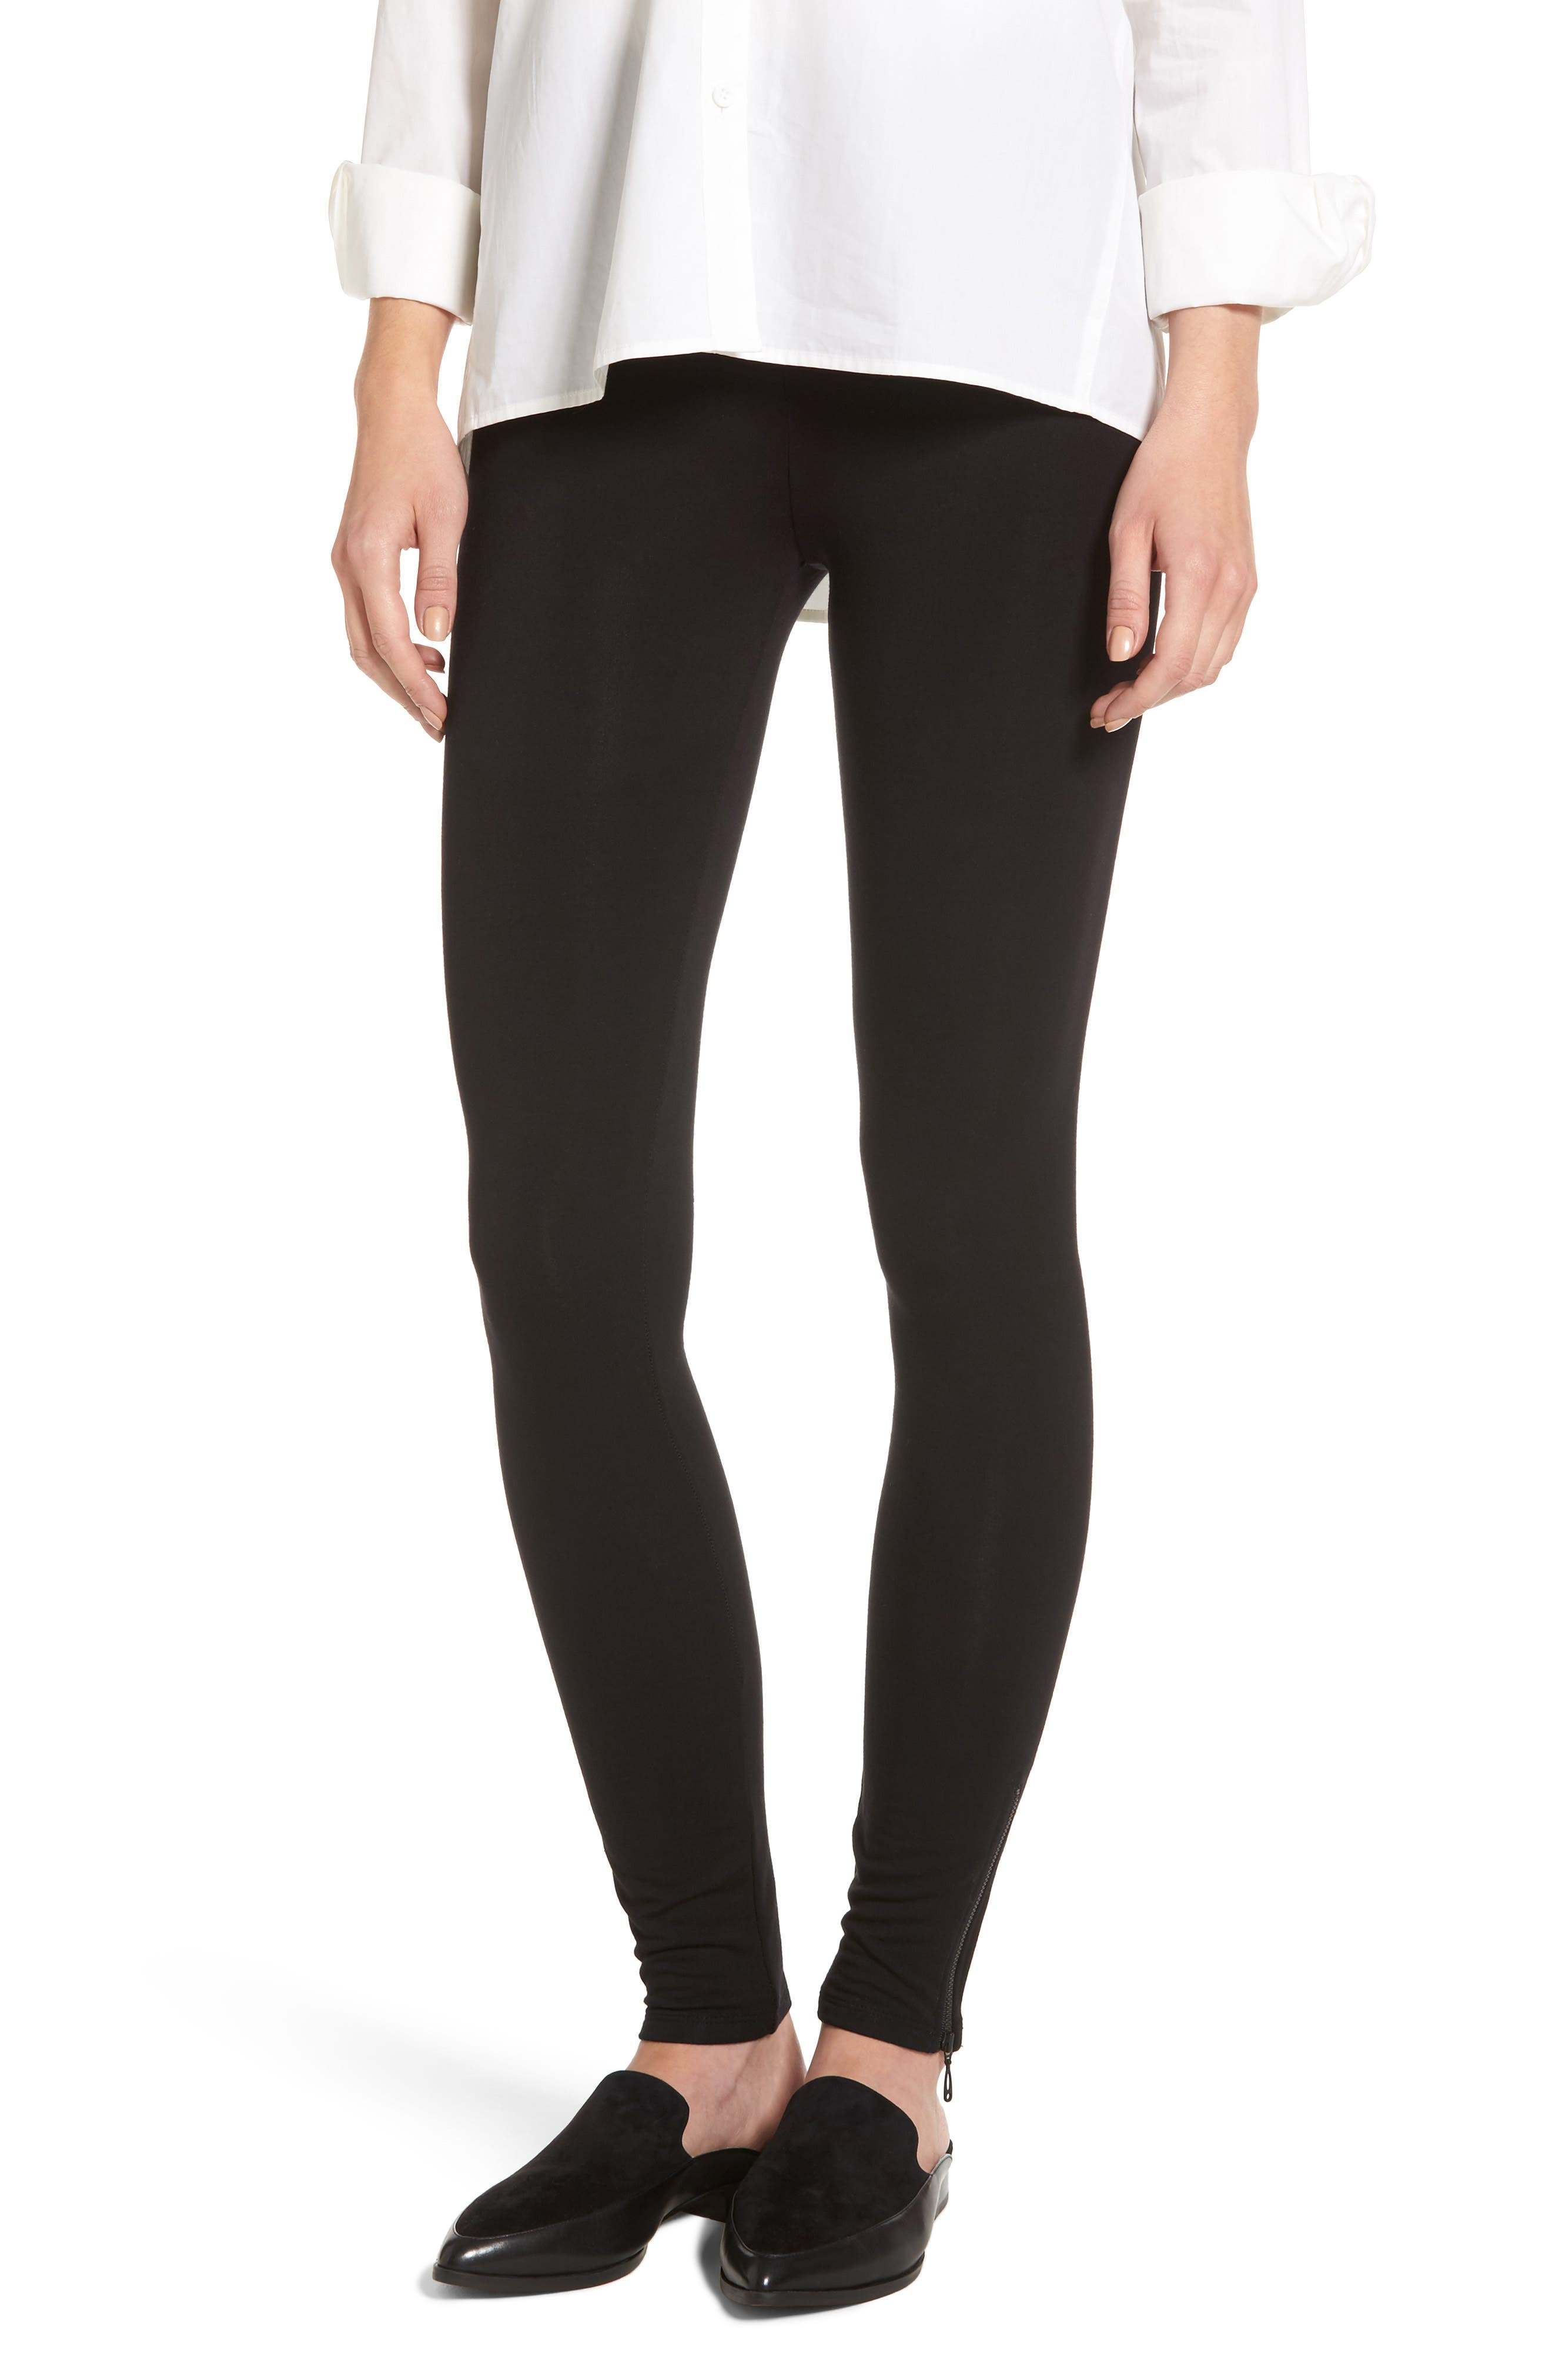 NIC + ZOE Cozy Zipper Leggings,                         Main,                         color, Black Onyx